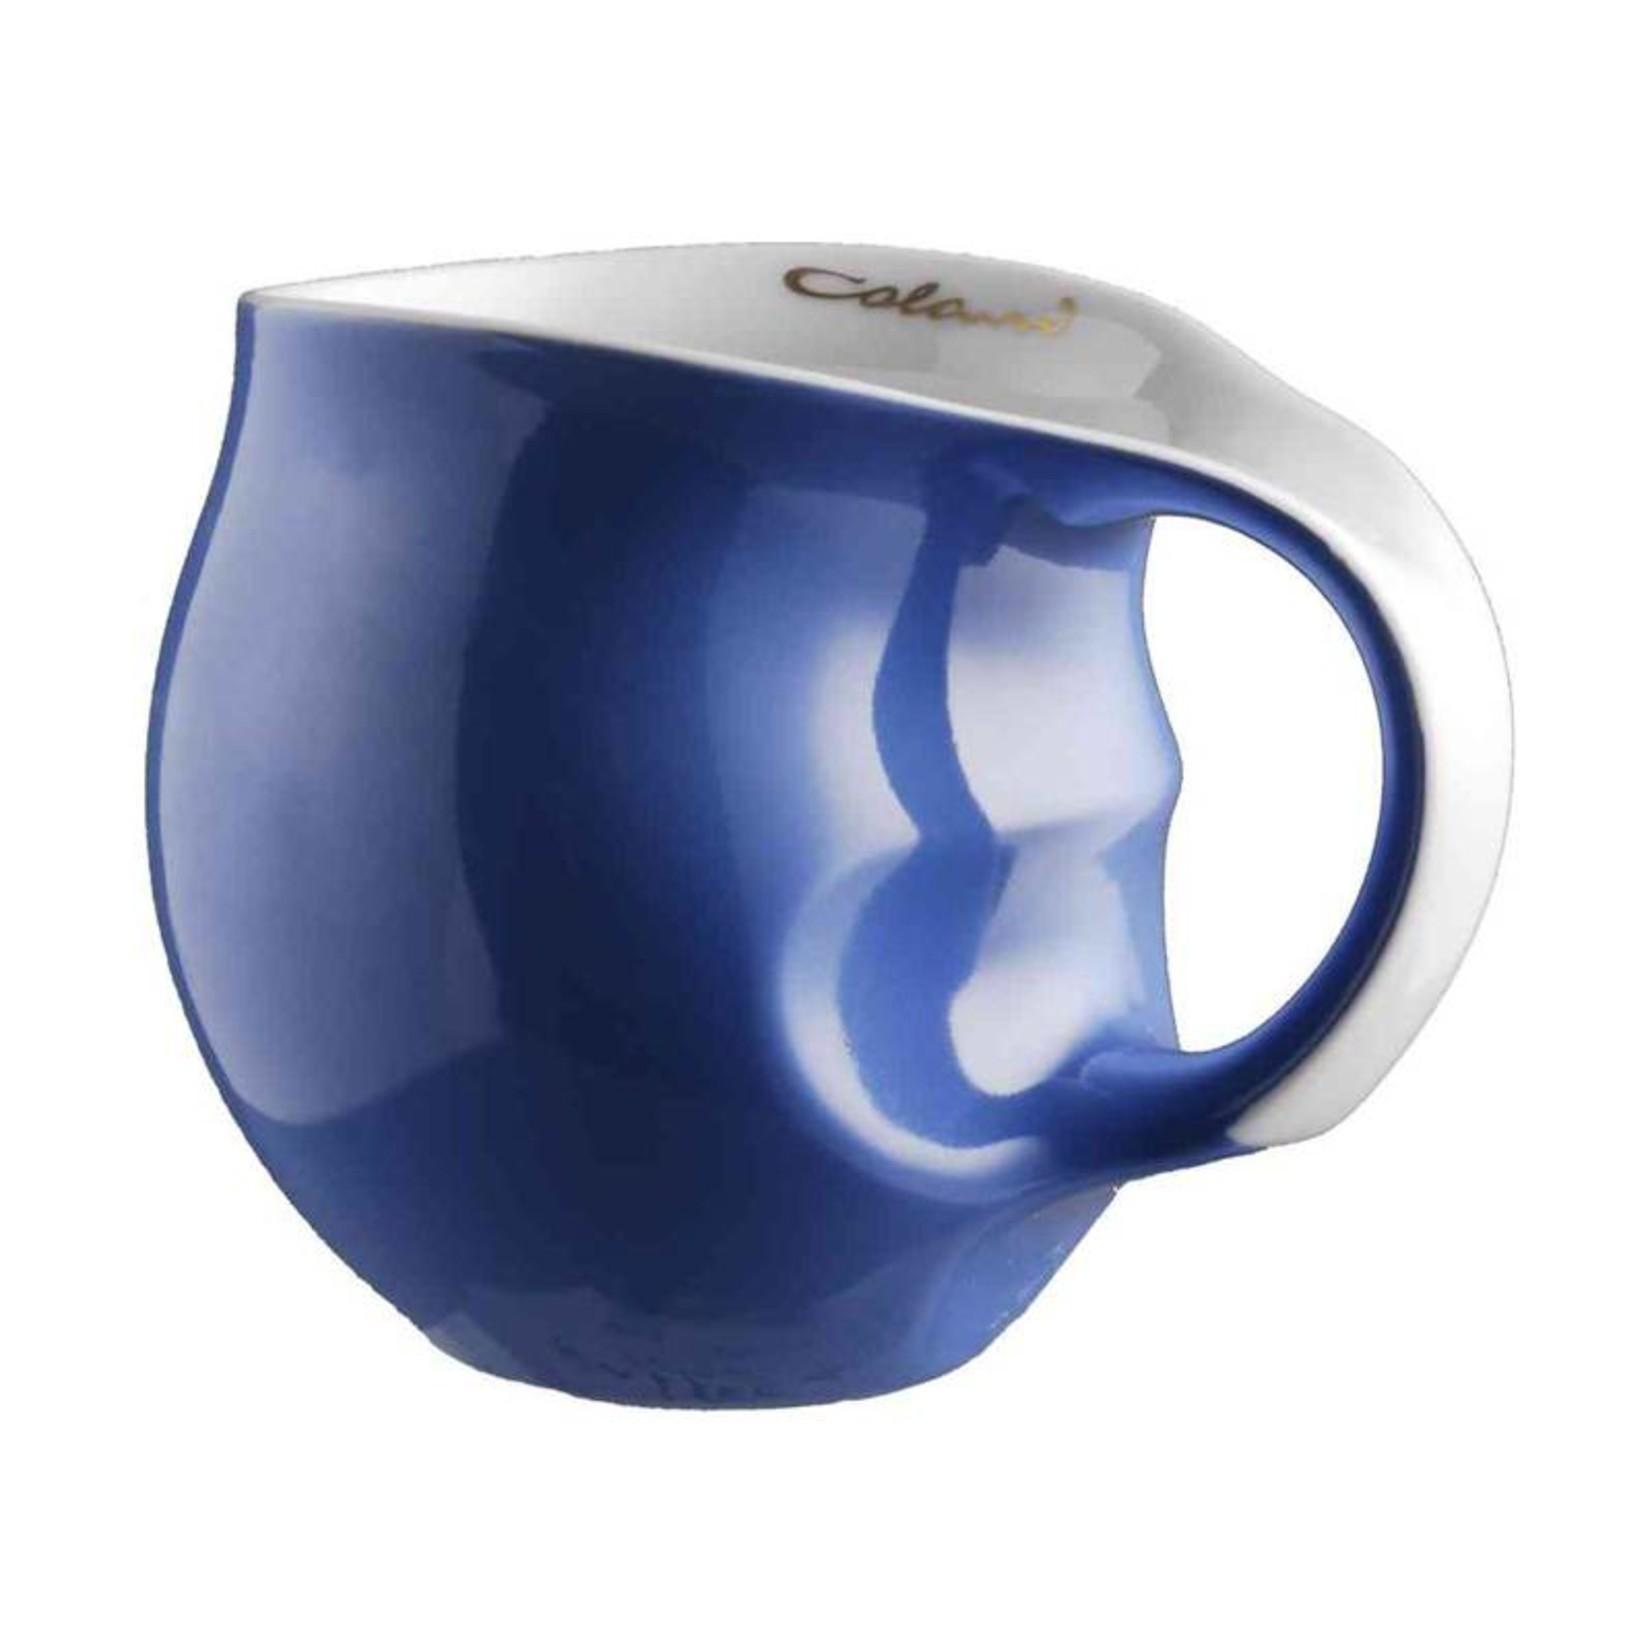 Colani Porzellanserie Colani Kaffeebecher | blau | Porzellan | Luigi Colani Design